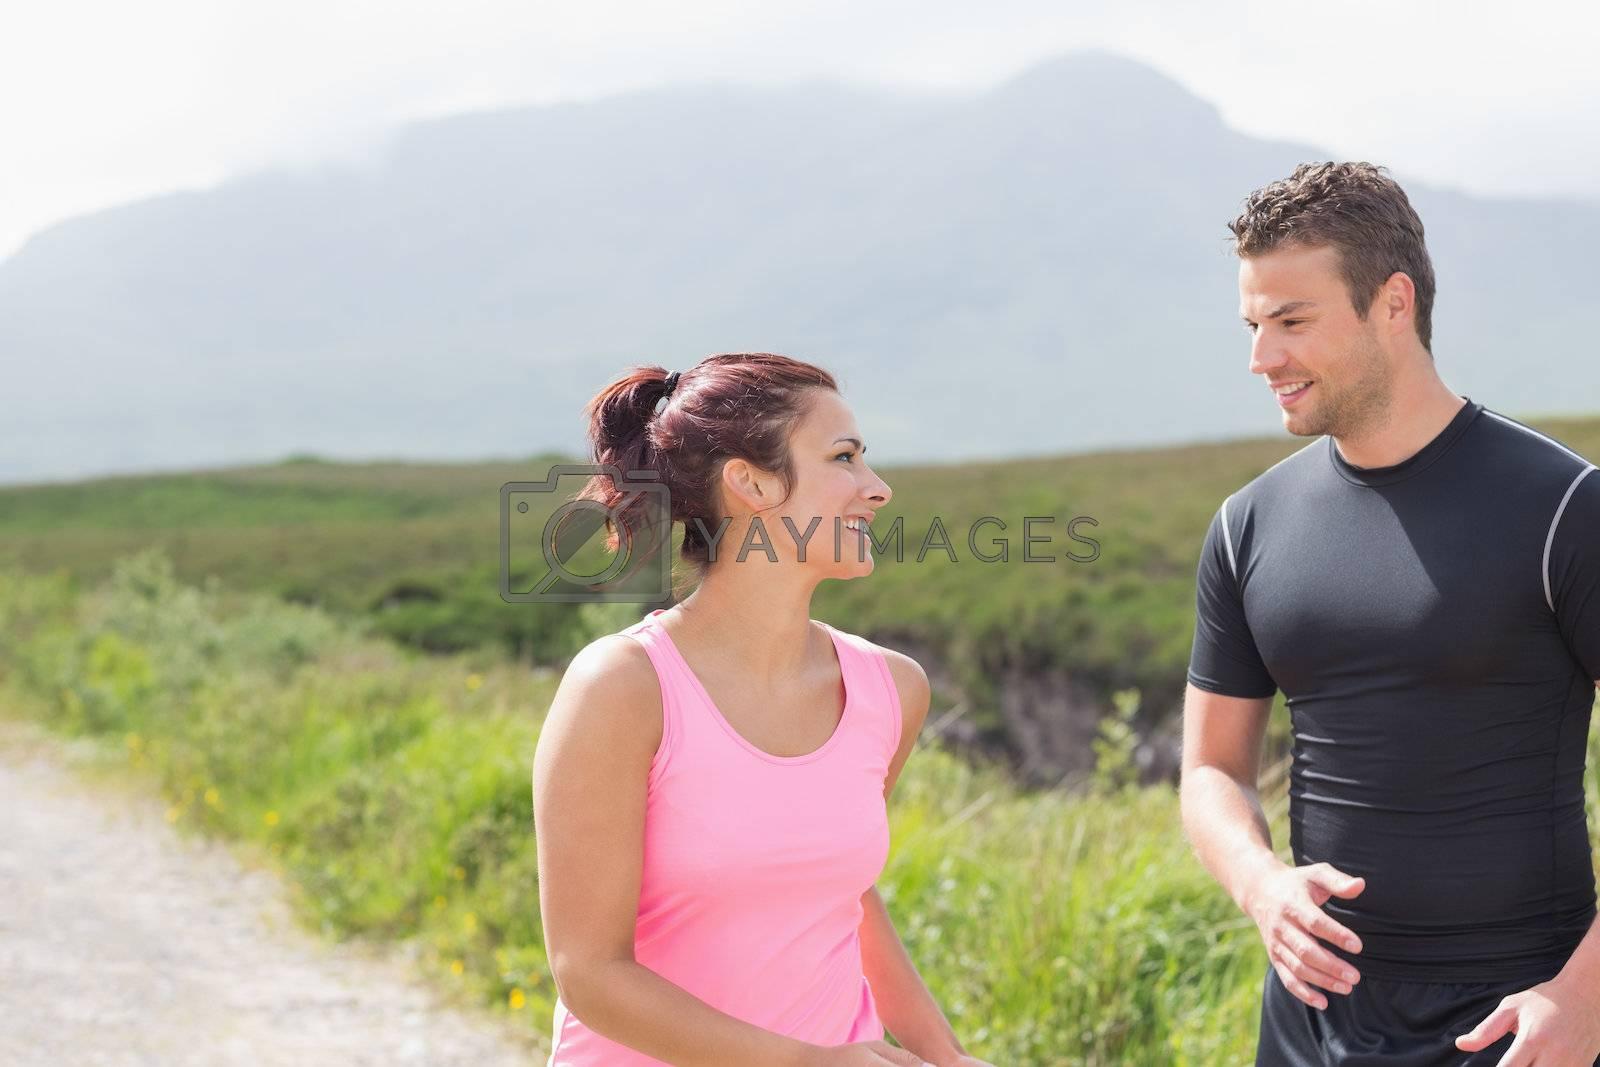 Athletic couple taking a break from jogging by Wavebreakmedia